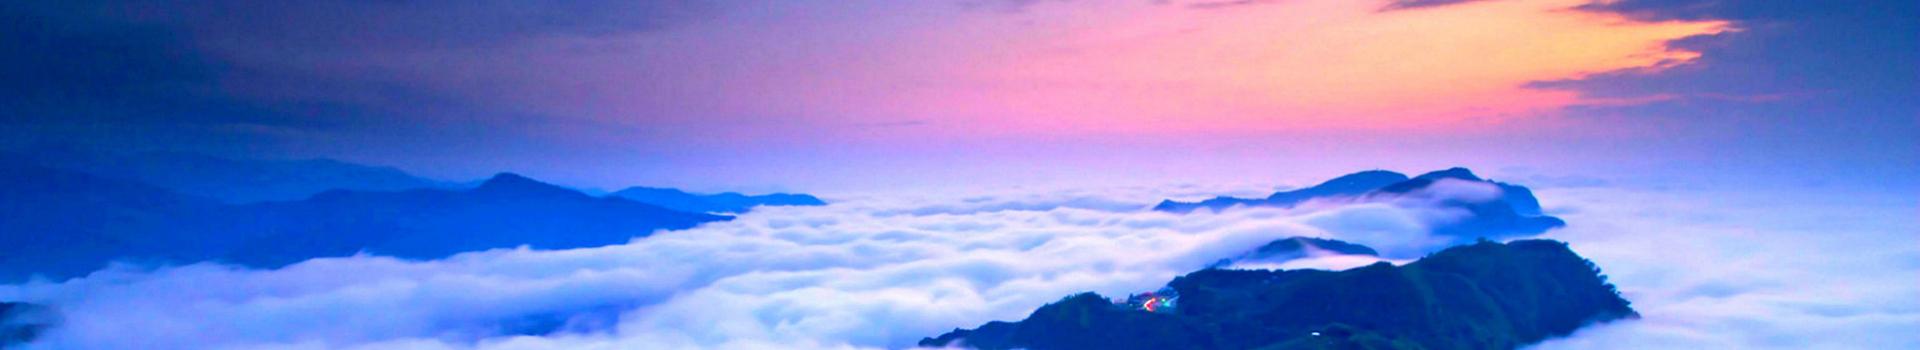 Секреты острова Тайвань: <br> Тайбэй, озеро Солнца и Луны, Алишань, Тайнань, Гаосюн, южное побережье, Тайдун, Хуалянь, Тароко, Тайбэй